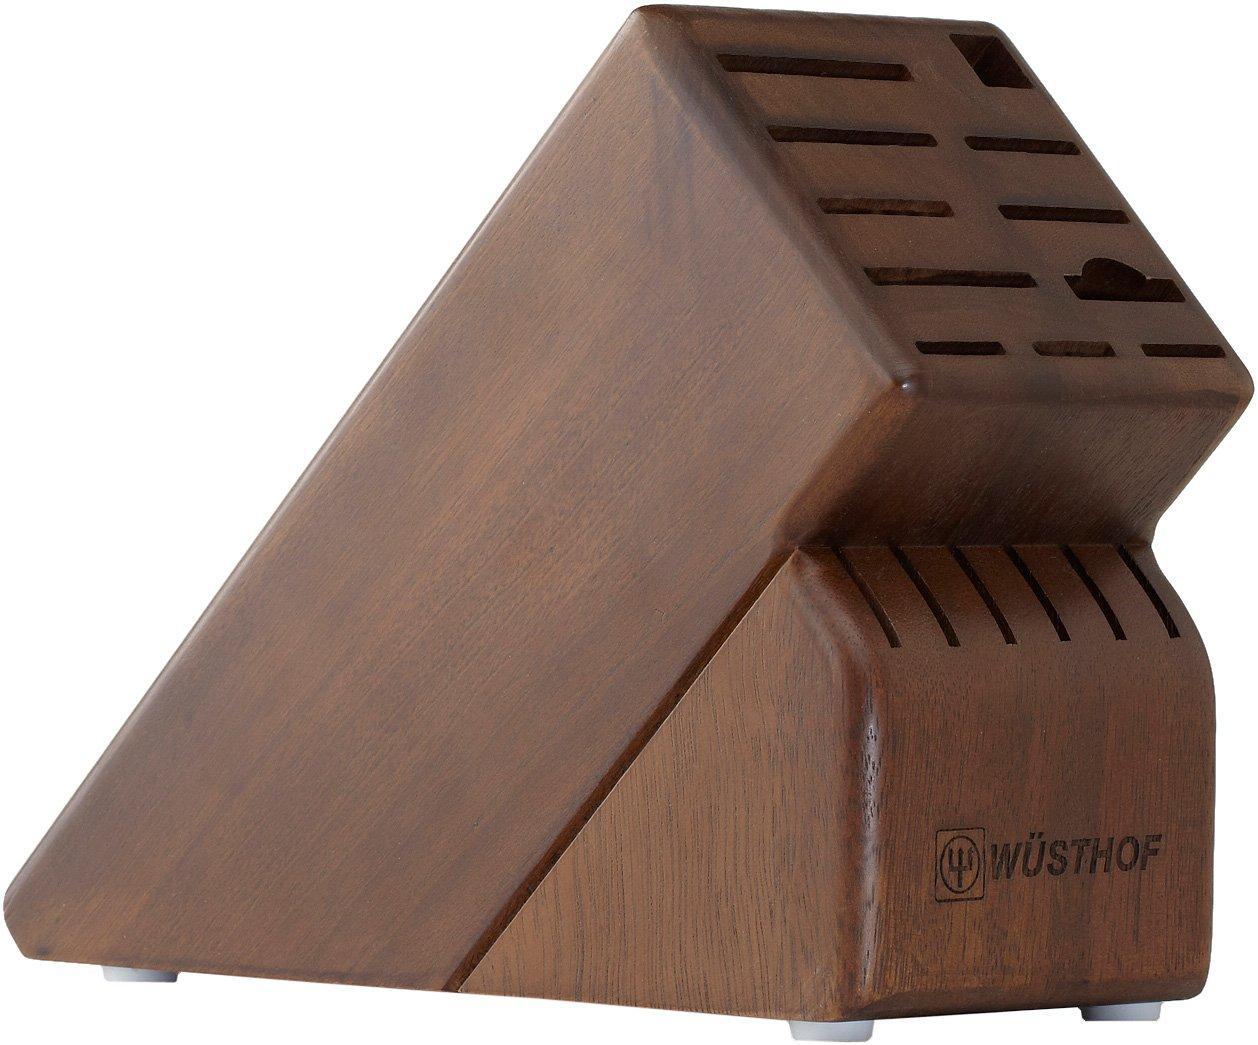 Amazon.com: Wusthof 17 Slot Storage Block, Walnut: Knife Blocks: Kitchen U0026  Dining